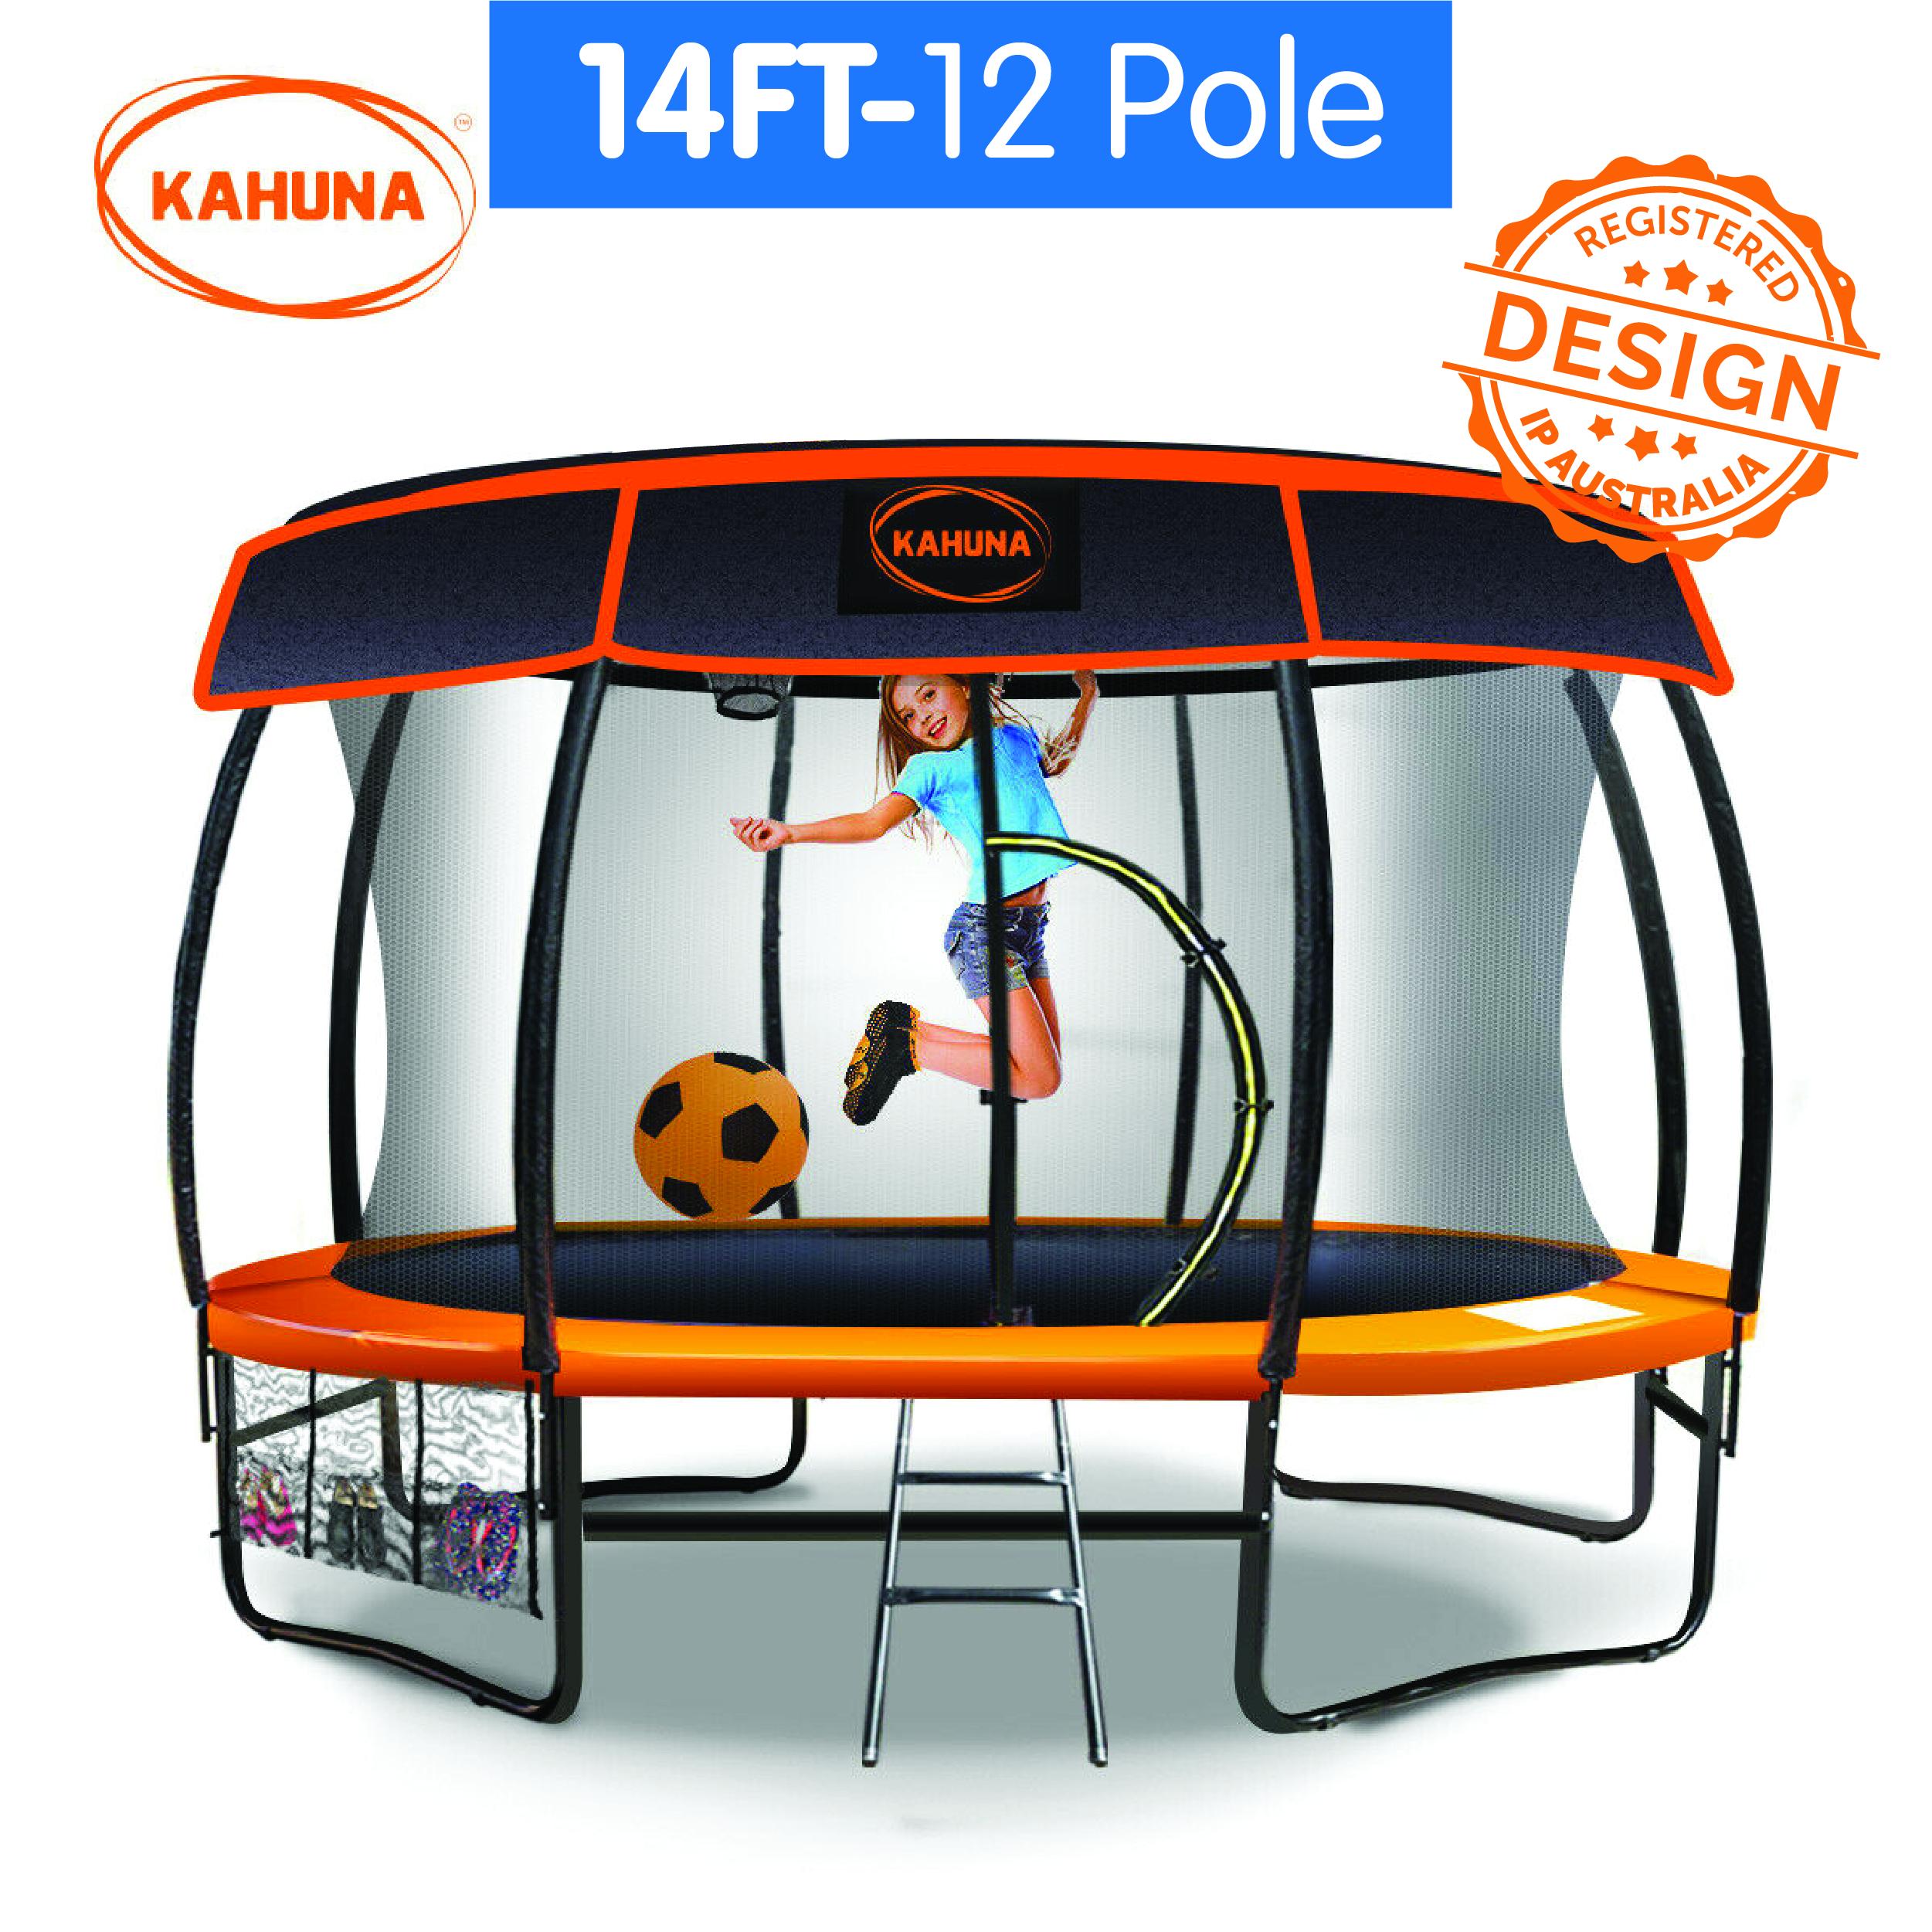 14ft-12 Pole Kahuna Trampoline Roof Shade Cover